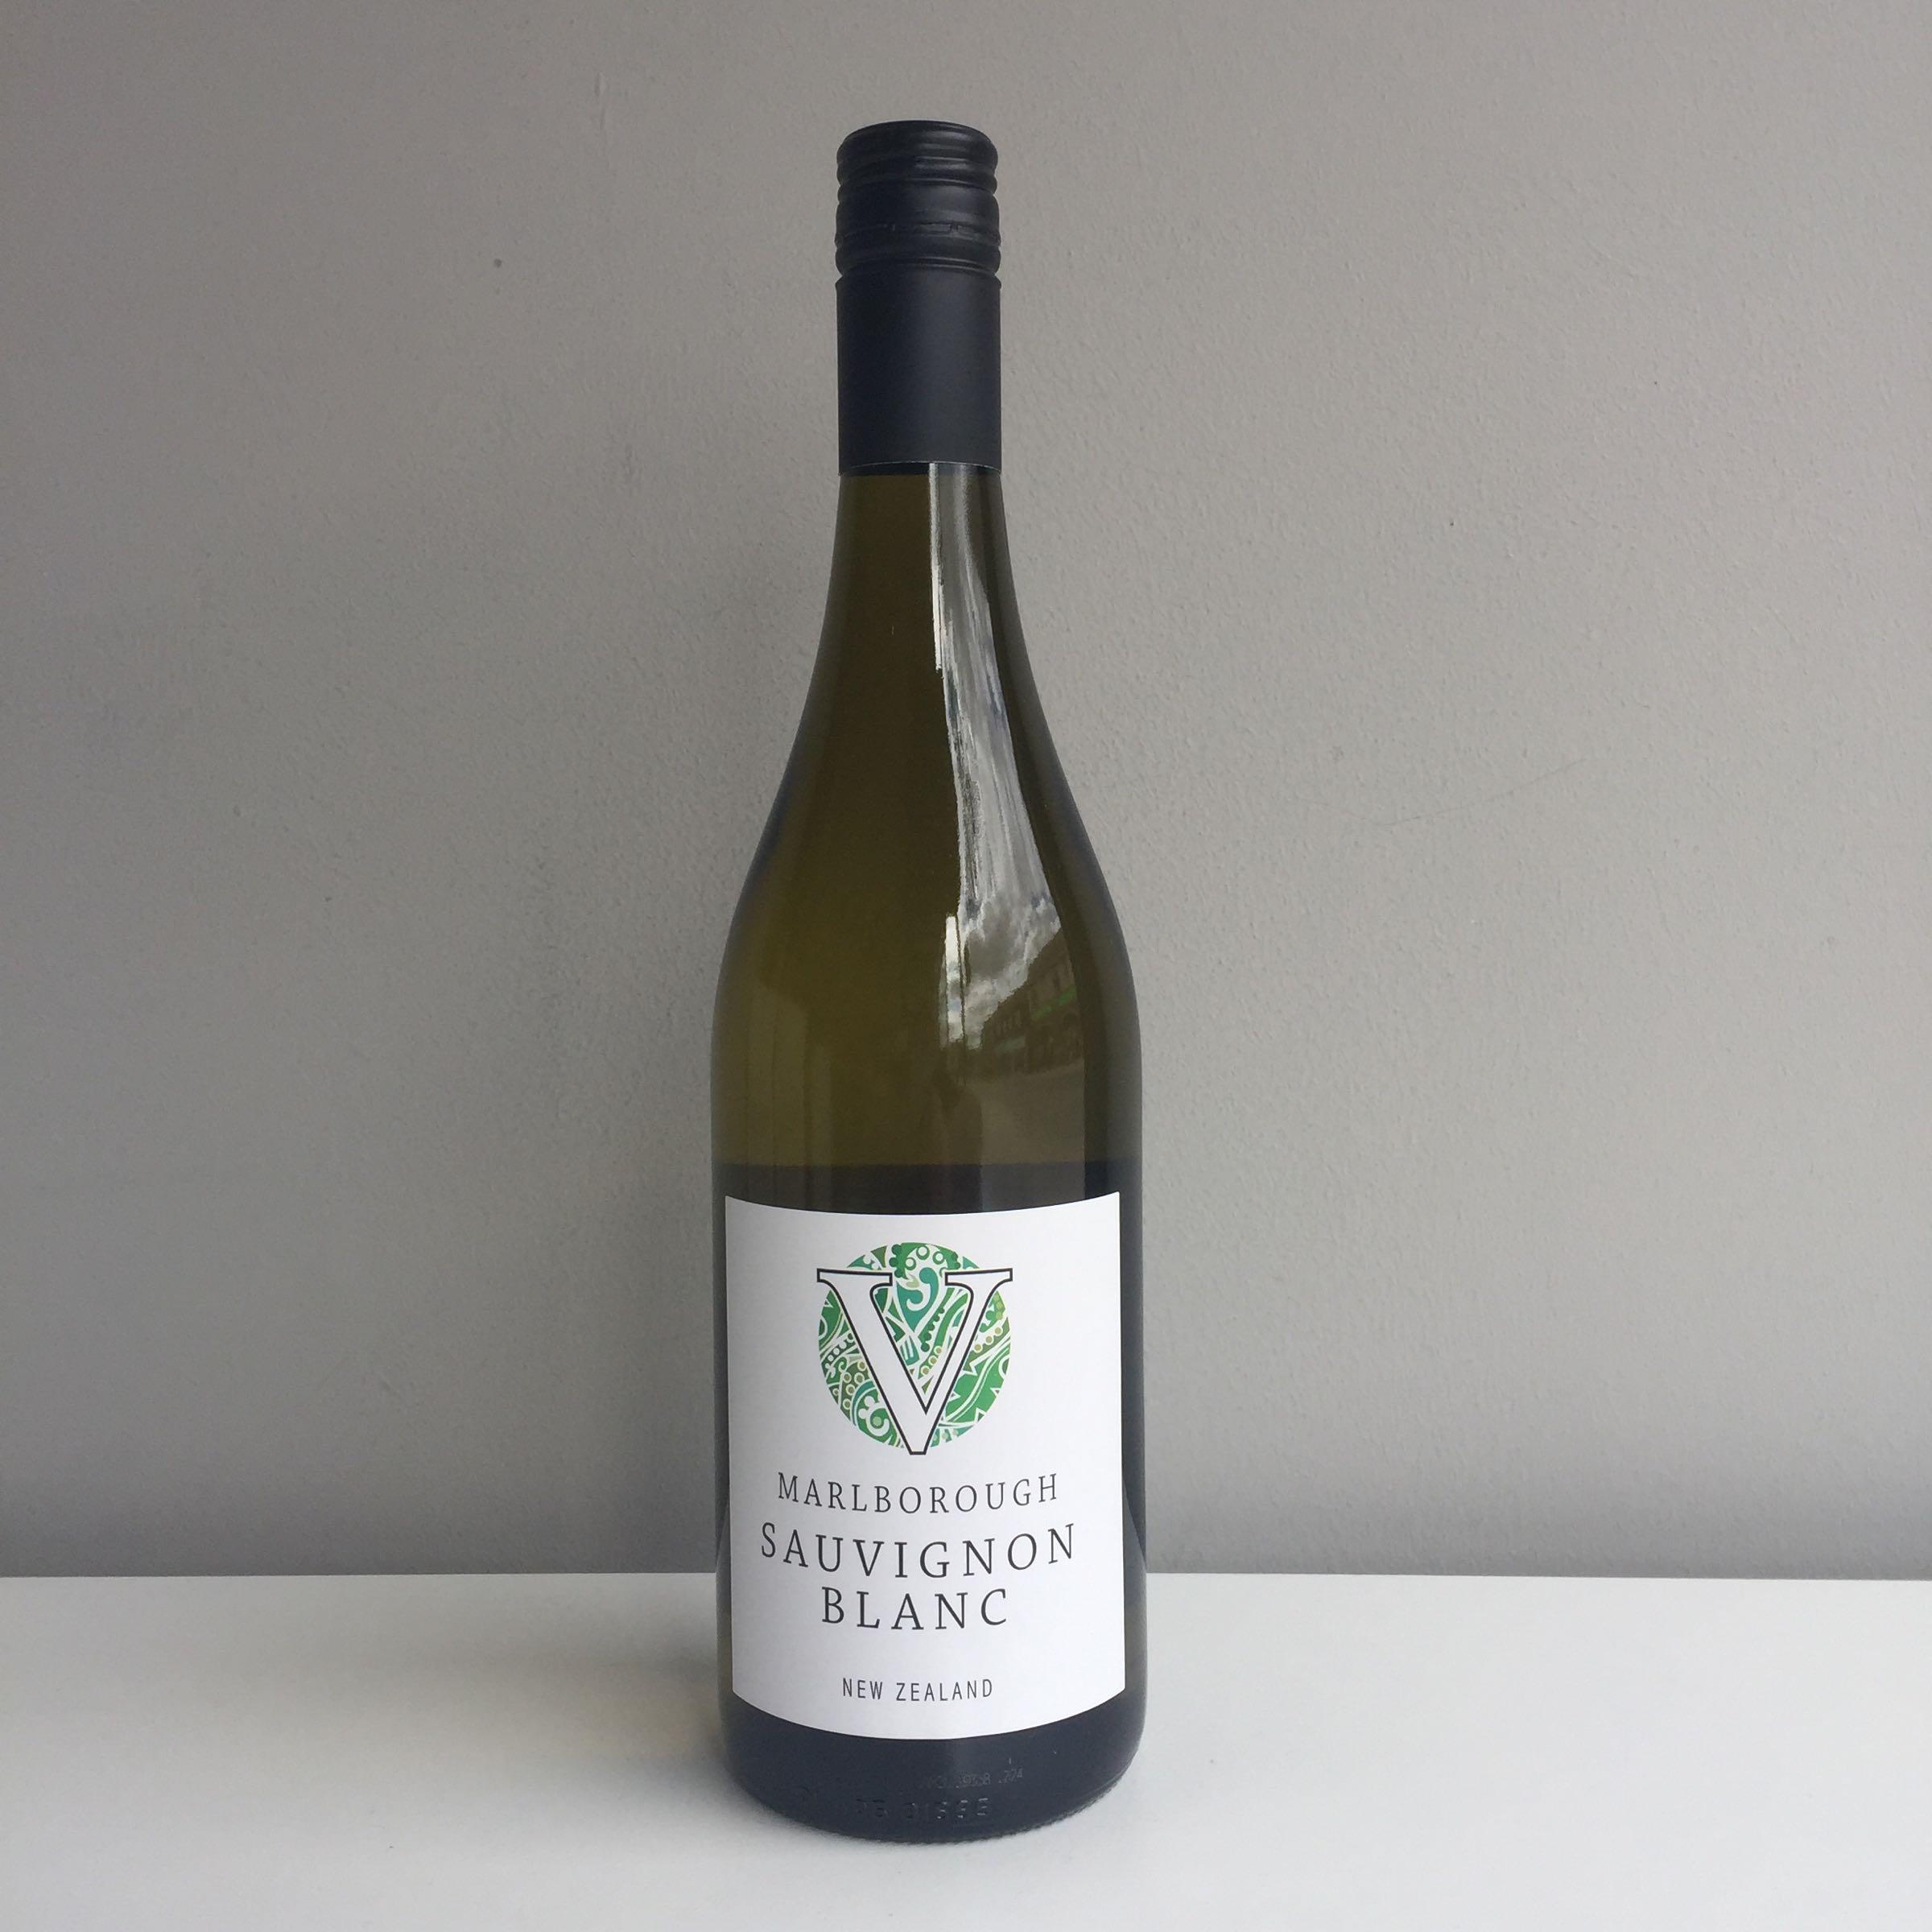 'V' Sauvignon Blanc - Marlborough New Zealand